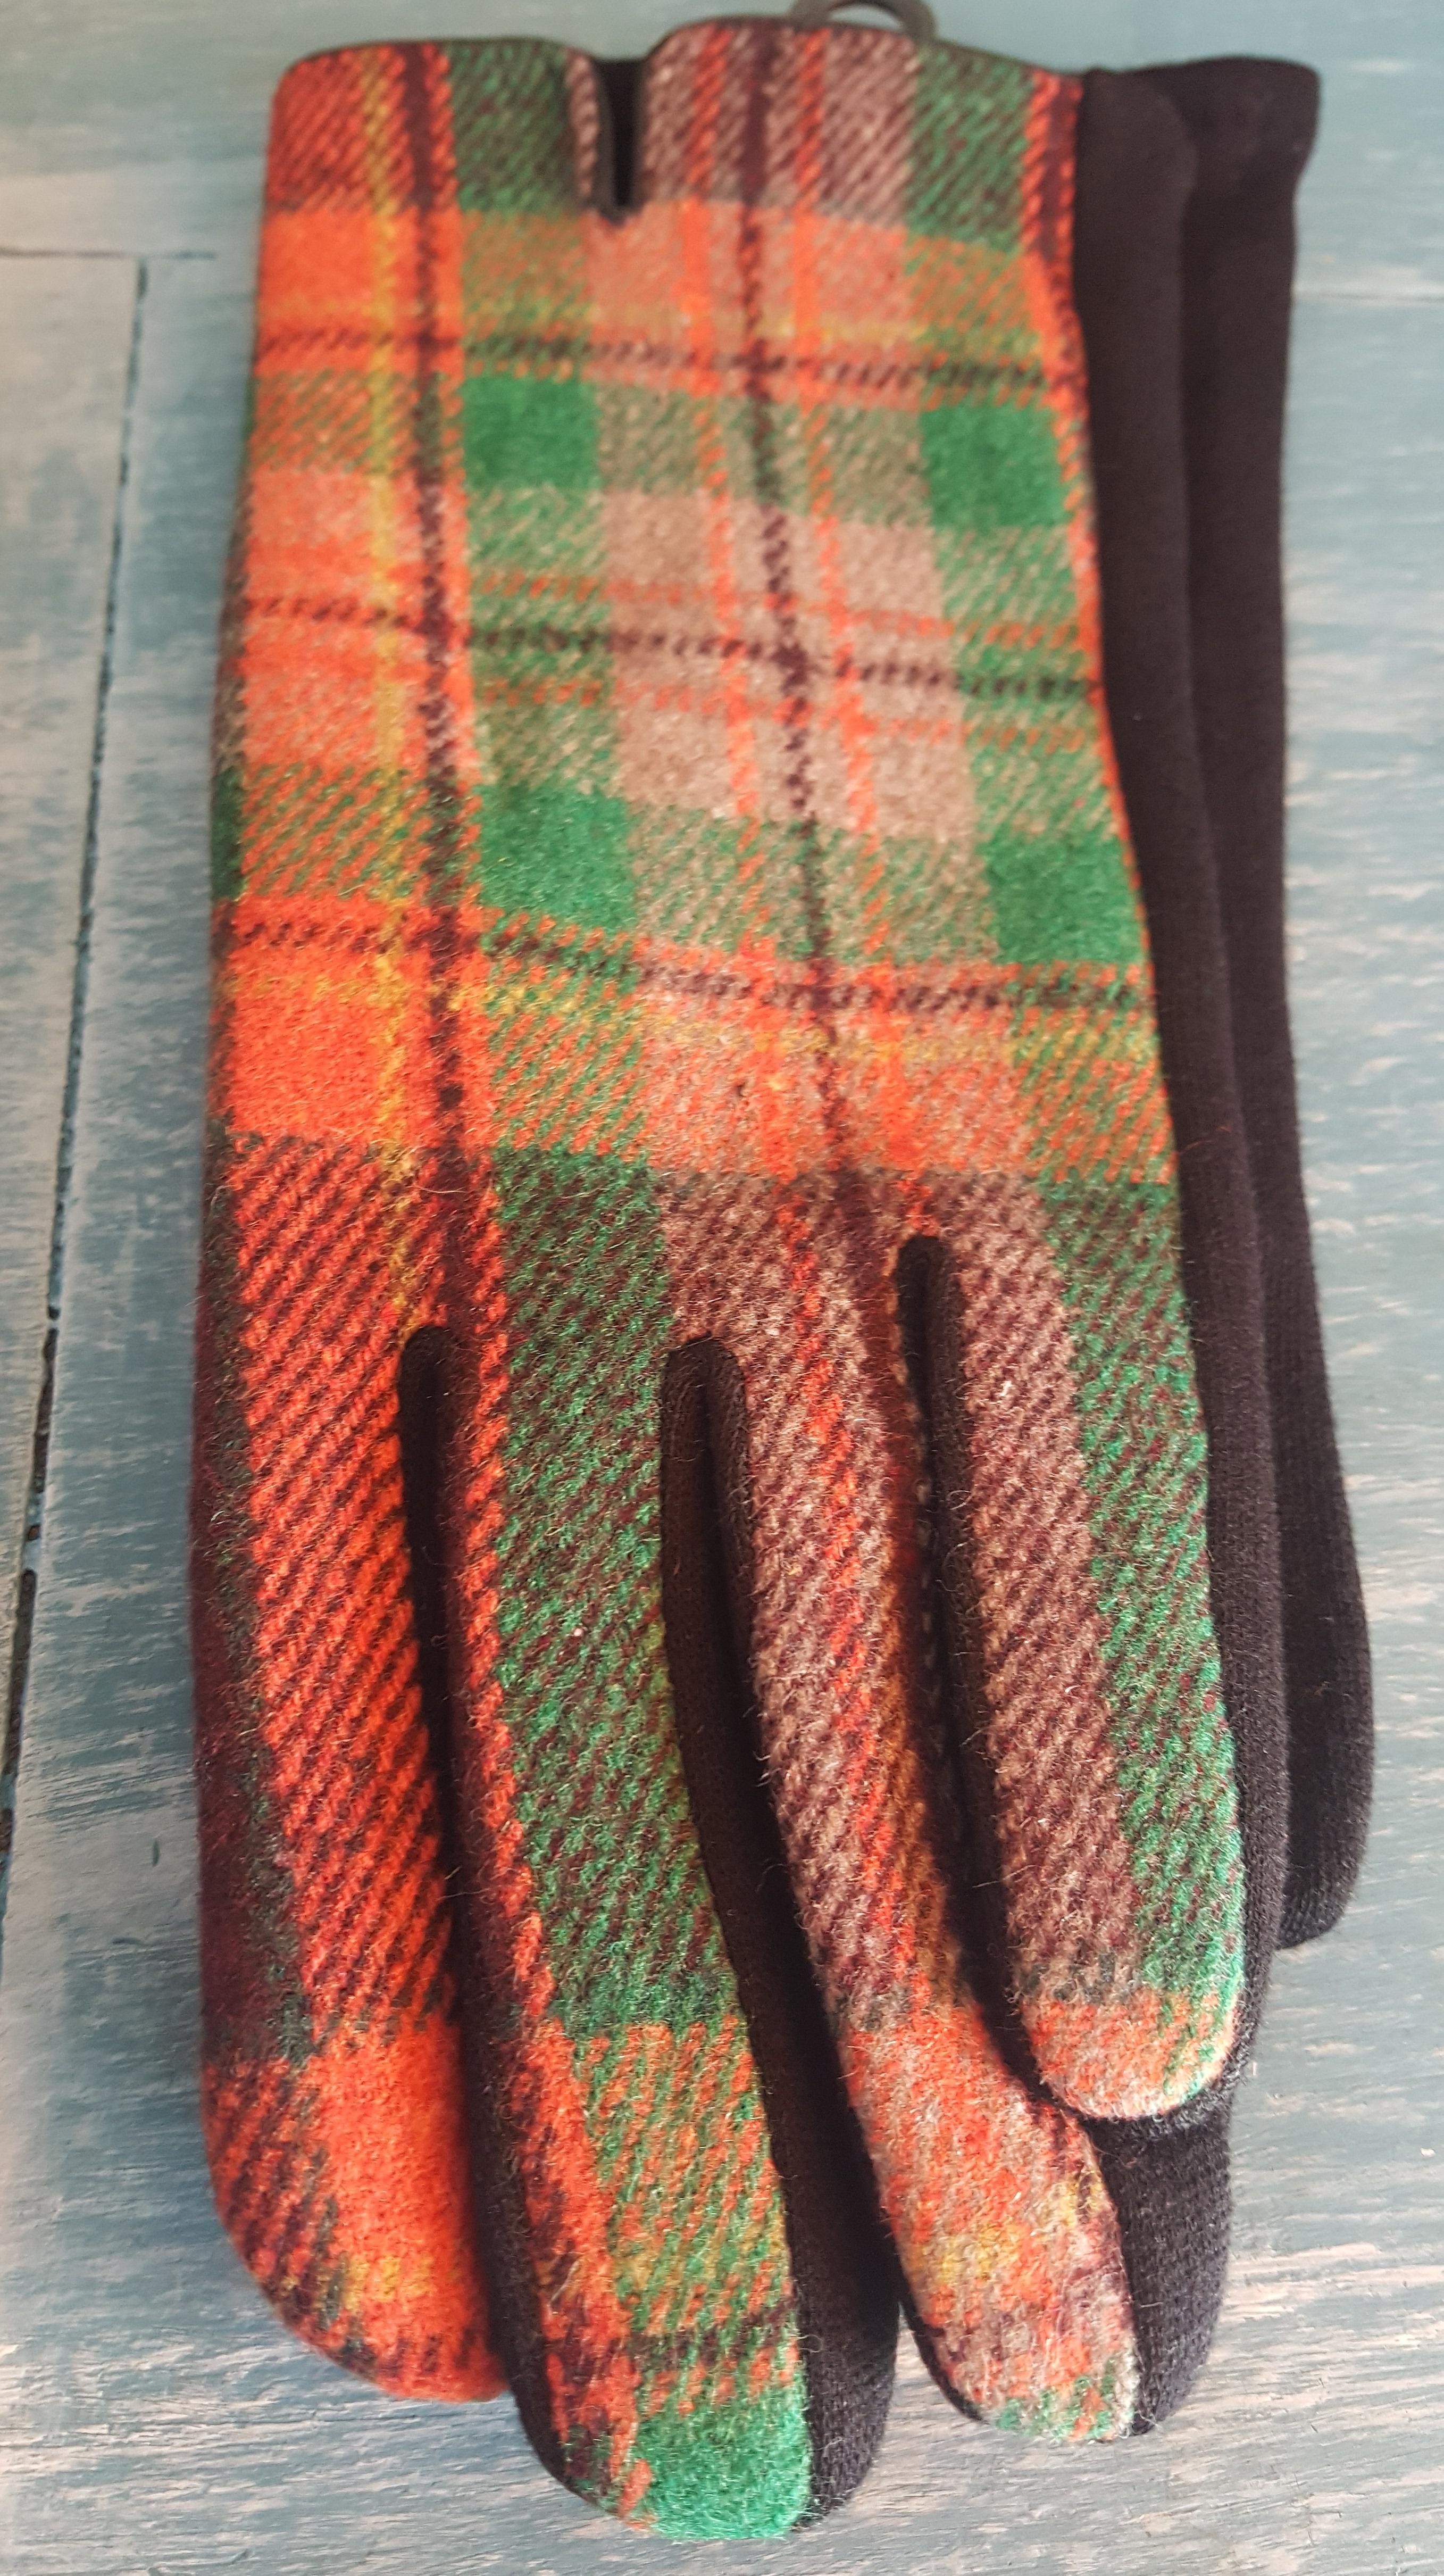 Ladies Gloves - Check Gloves